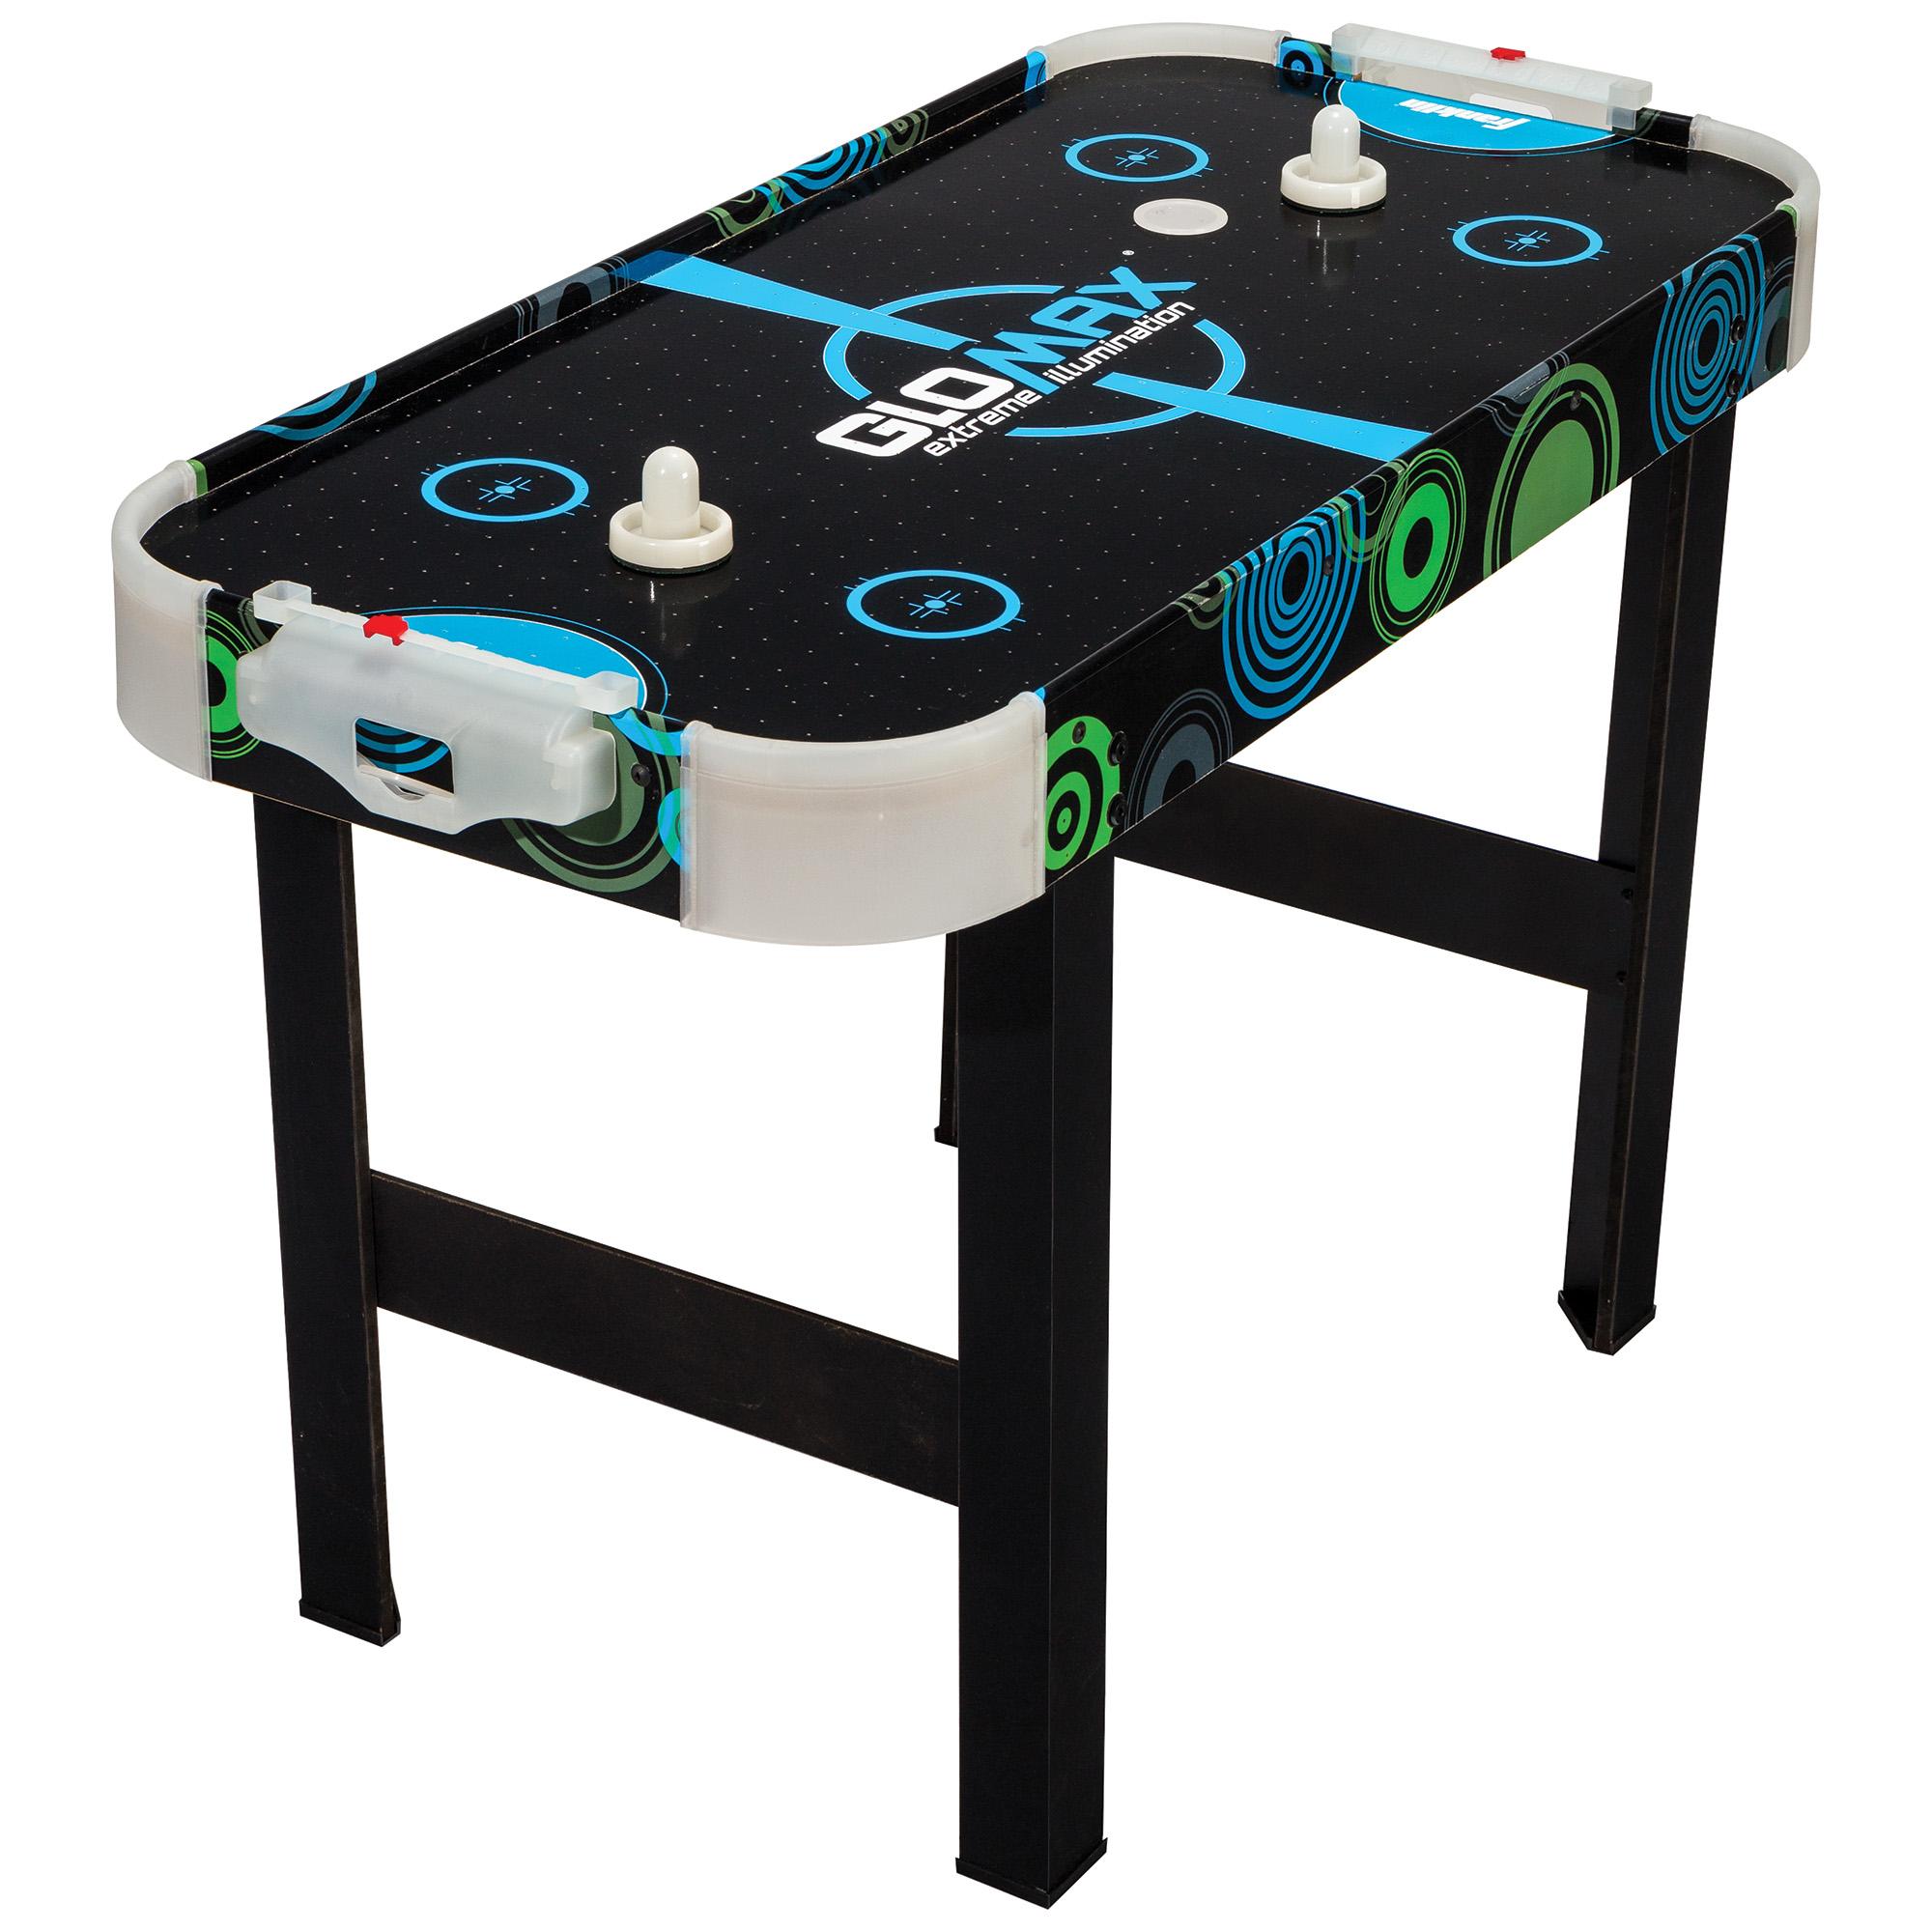 "Franklin Sports Glomax Glow-in-the-Dark Air Hockey Table, 40"" x 20"" x 27"""